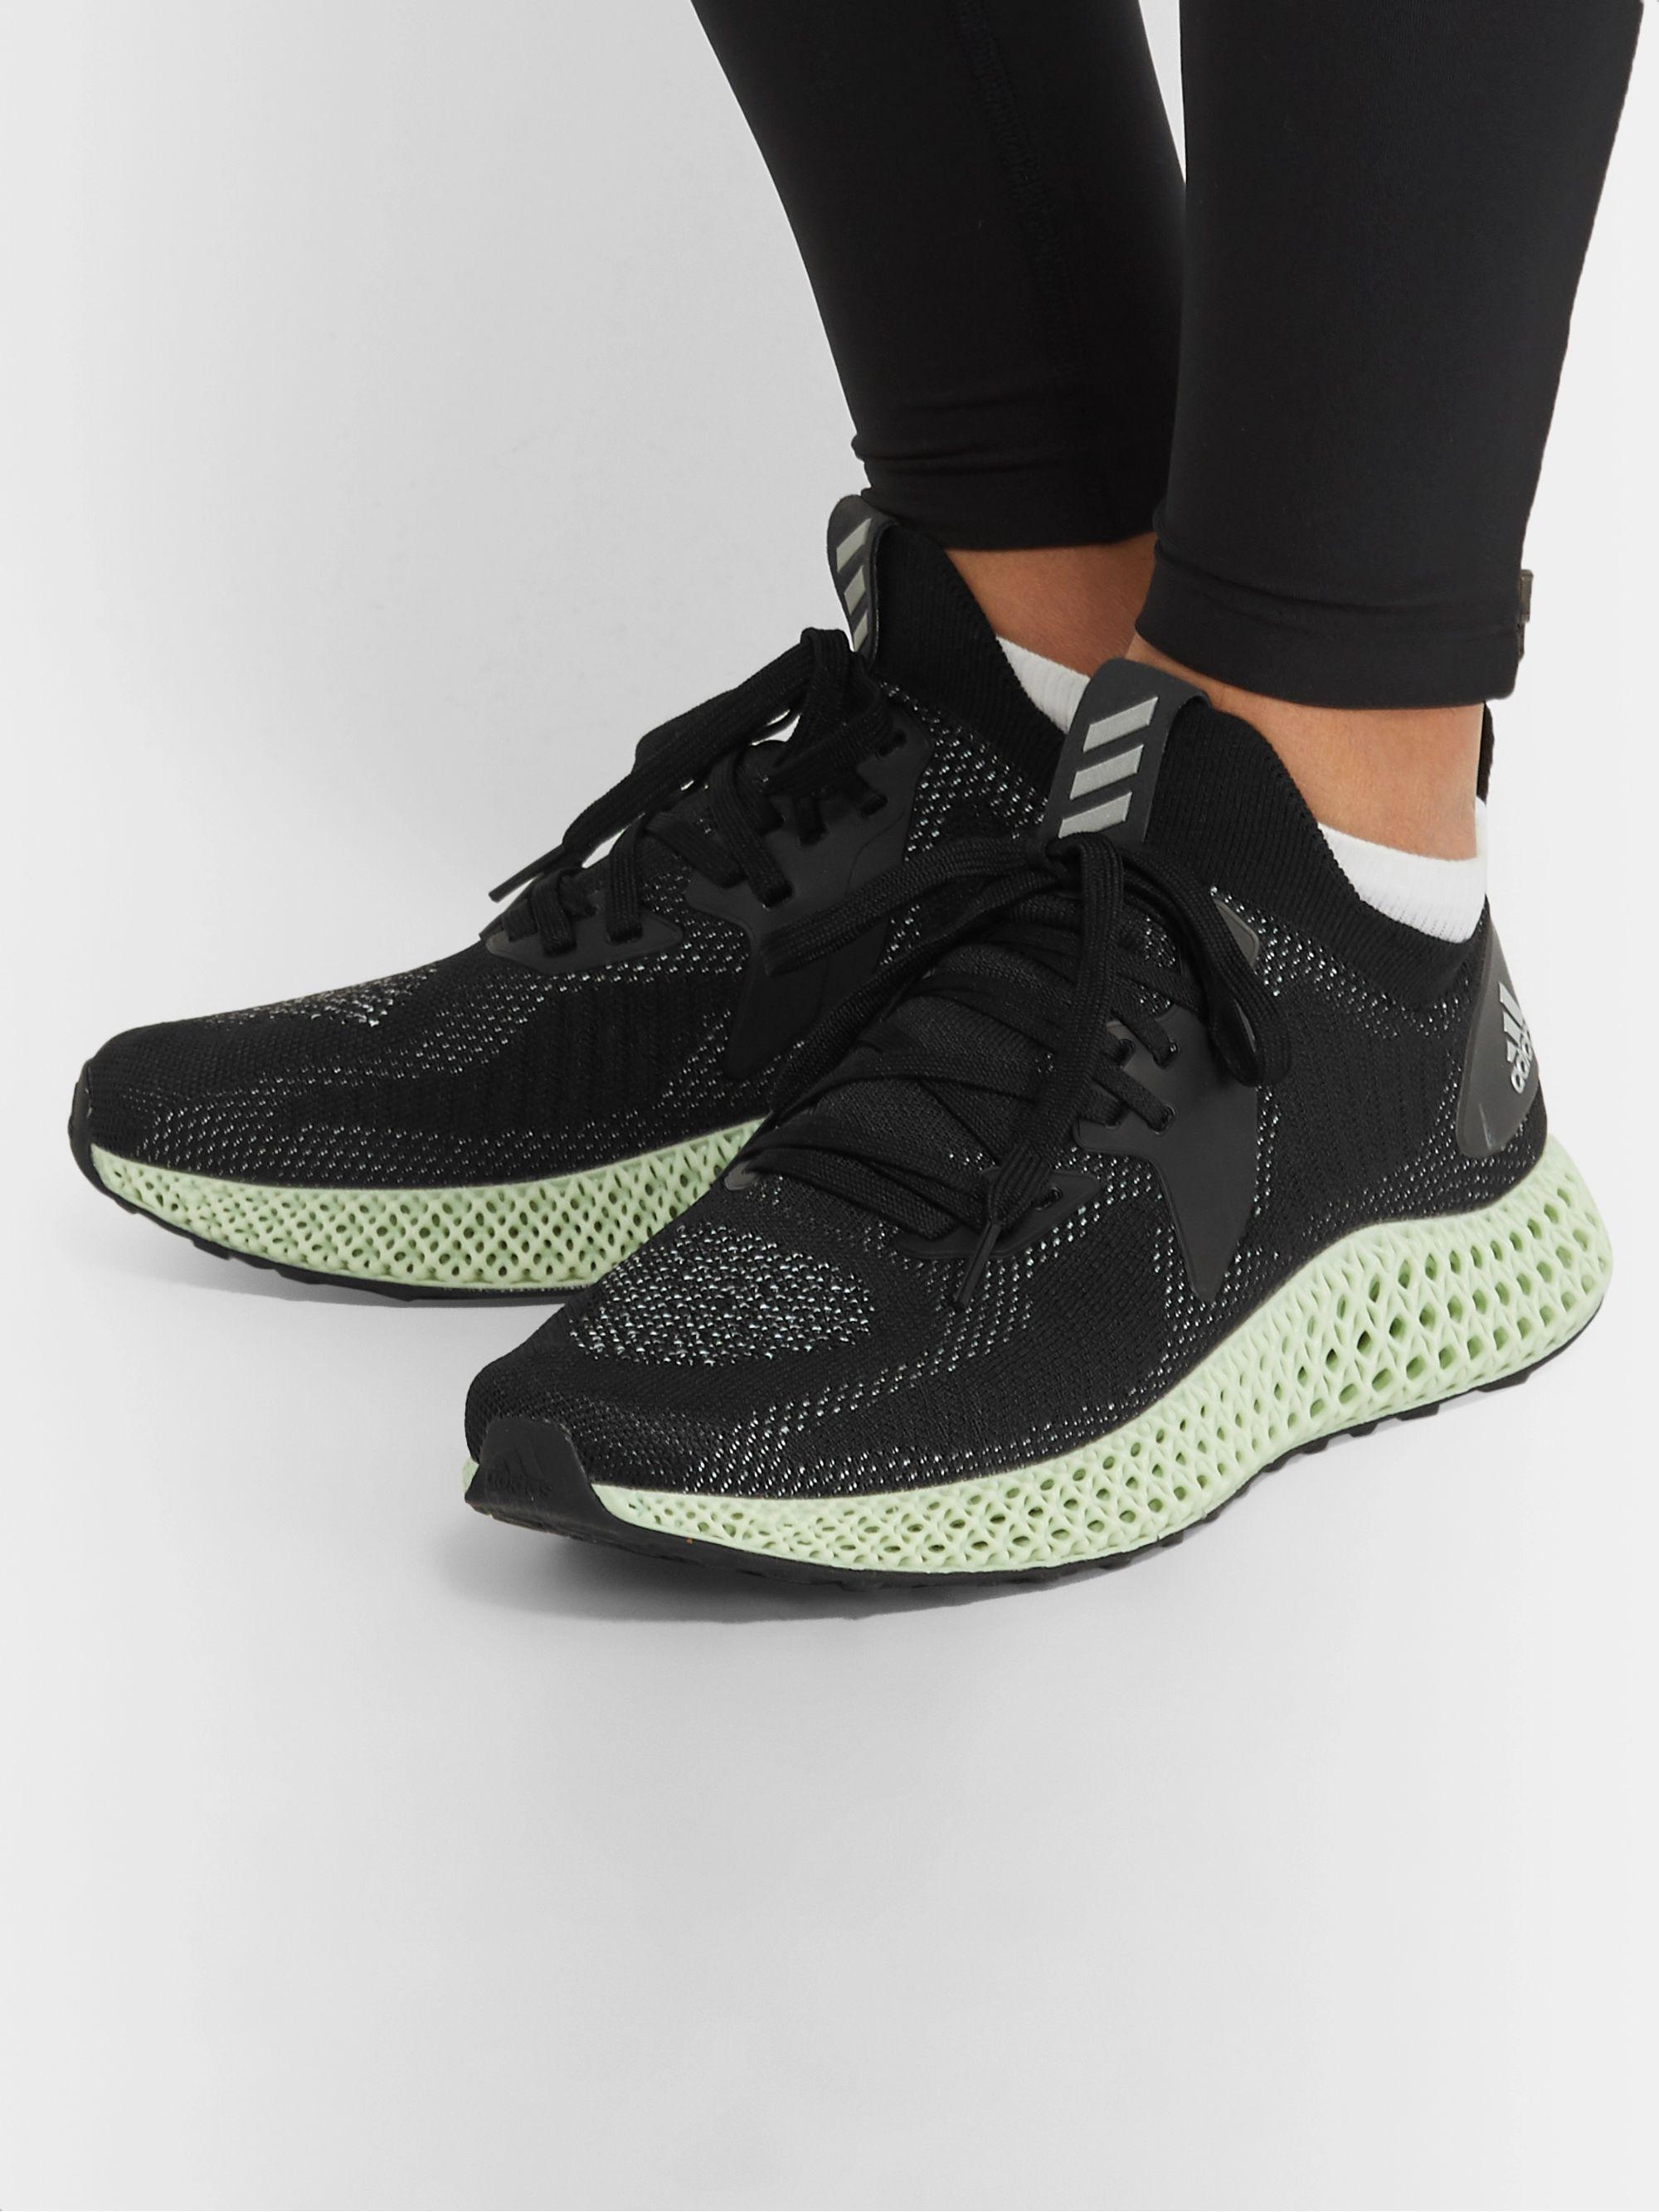 AlphaEdge 4D Rubber Trimmed Primeknit Running Sneakers